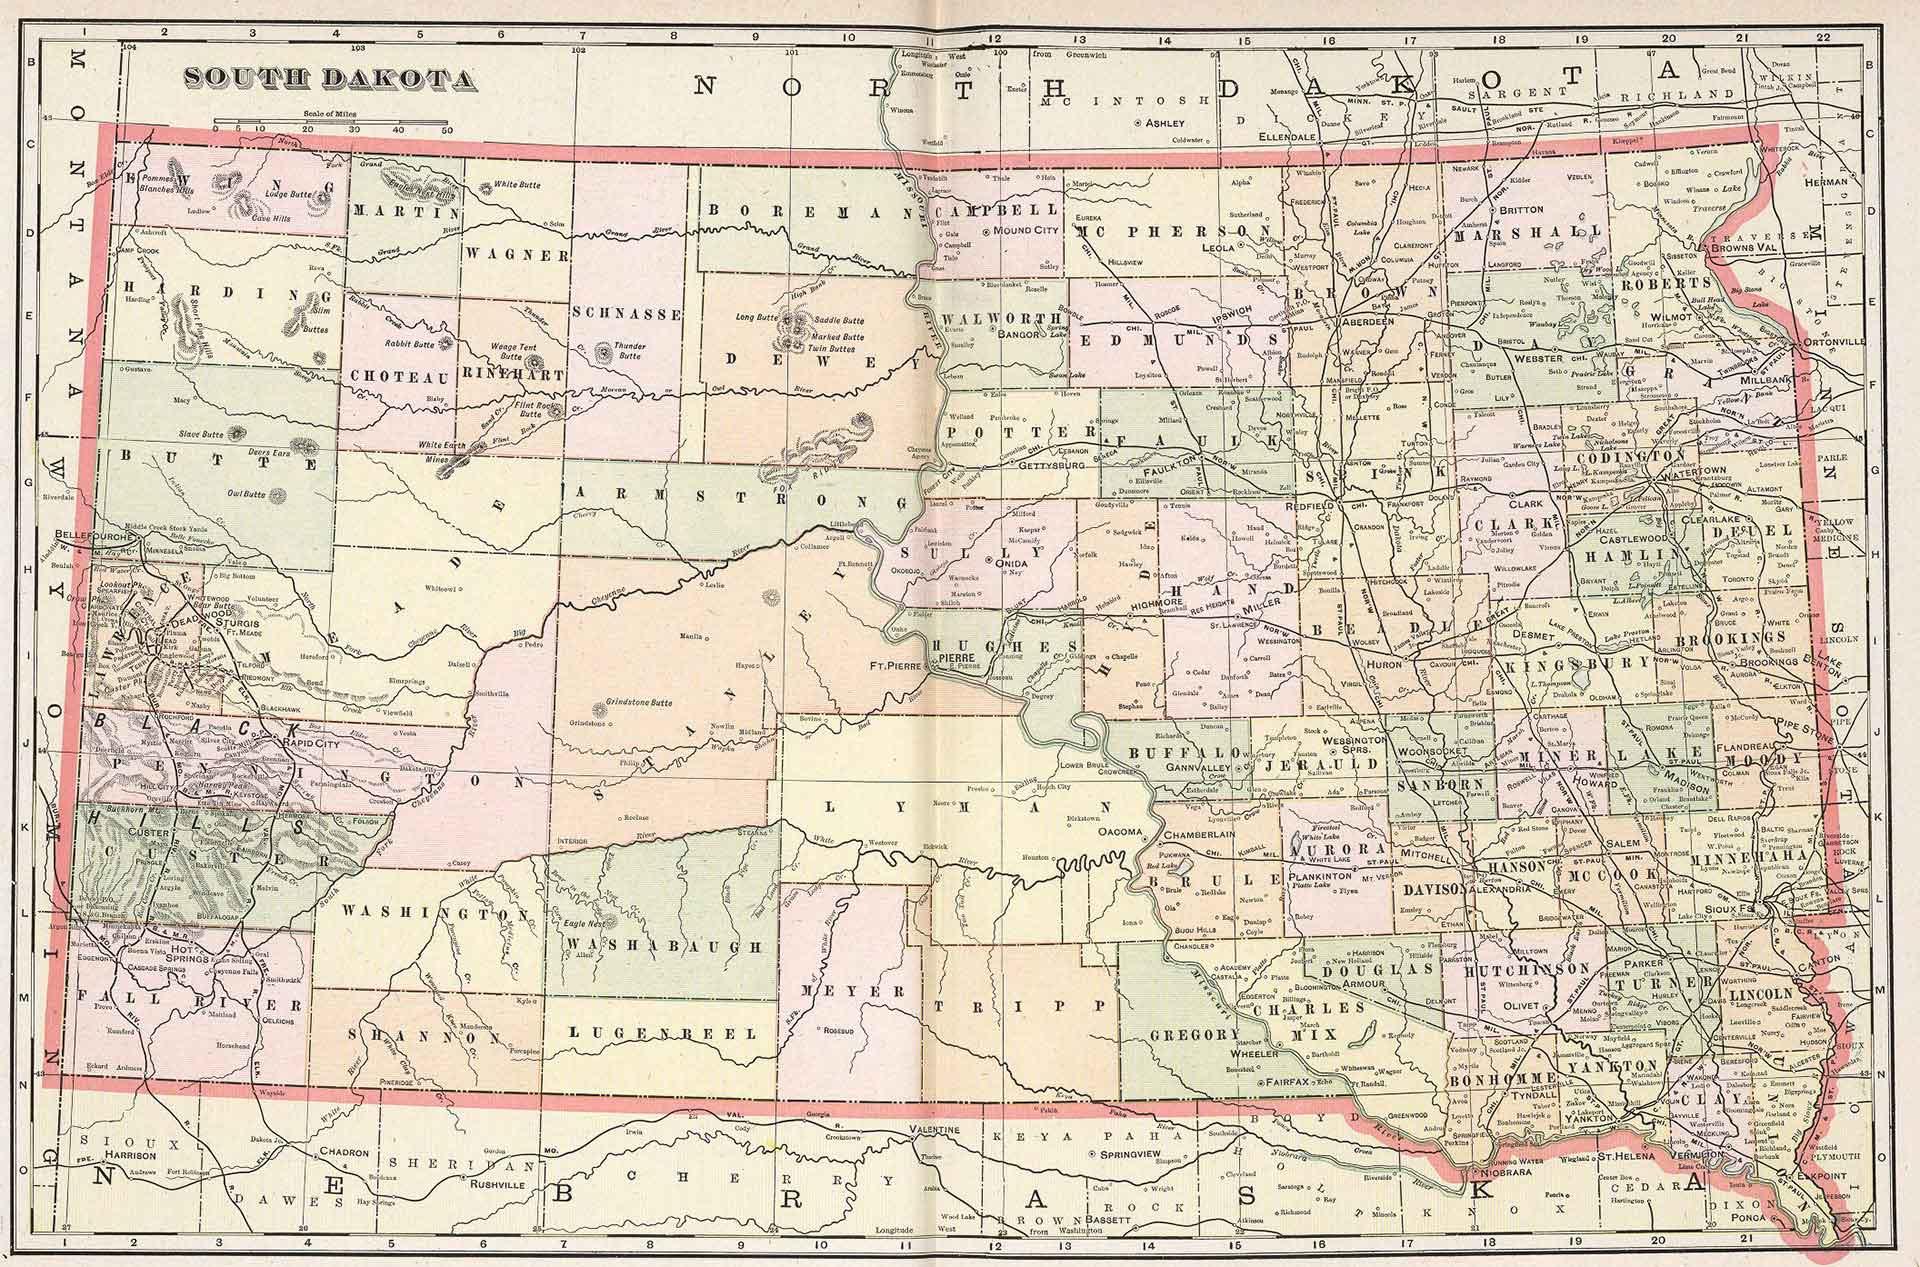 south dakota public land map Old Historical City County And State Maps Of South Dakota south dakota public land map